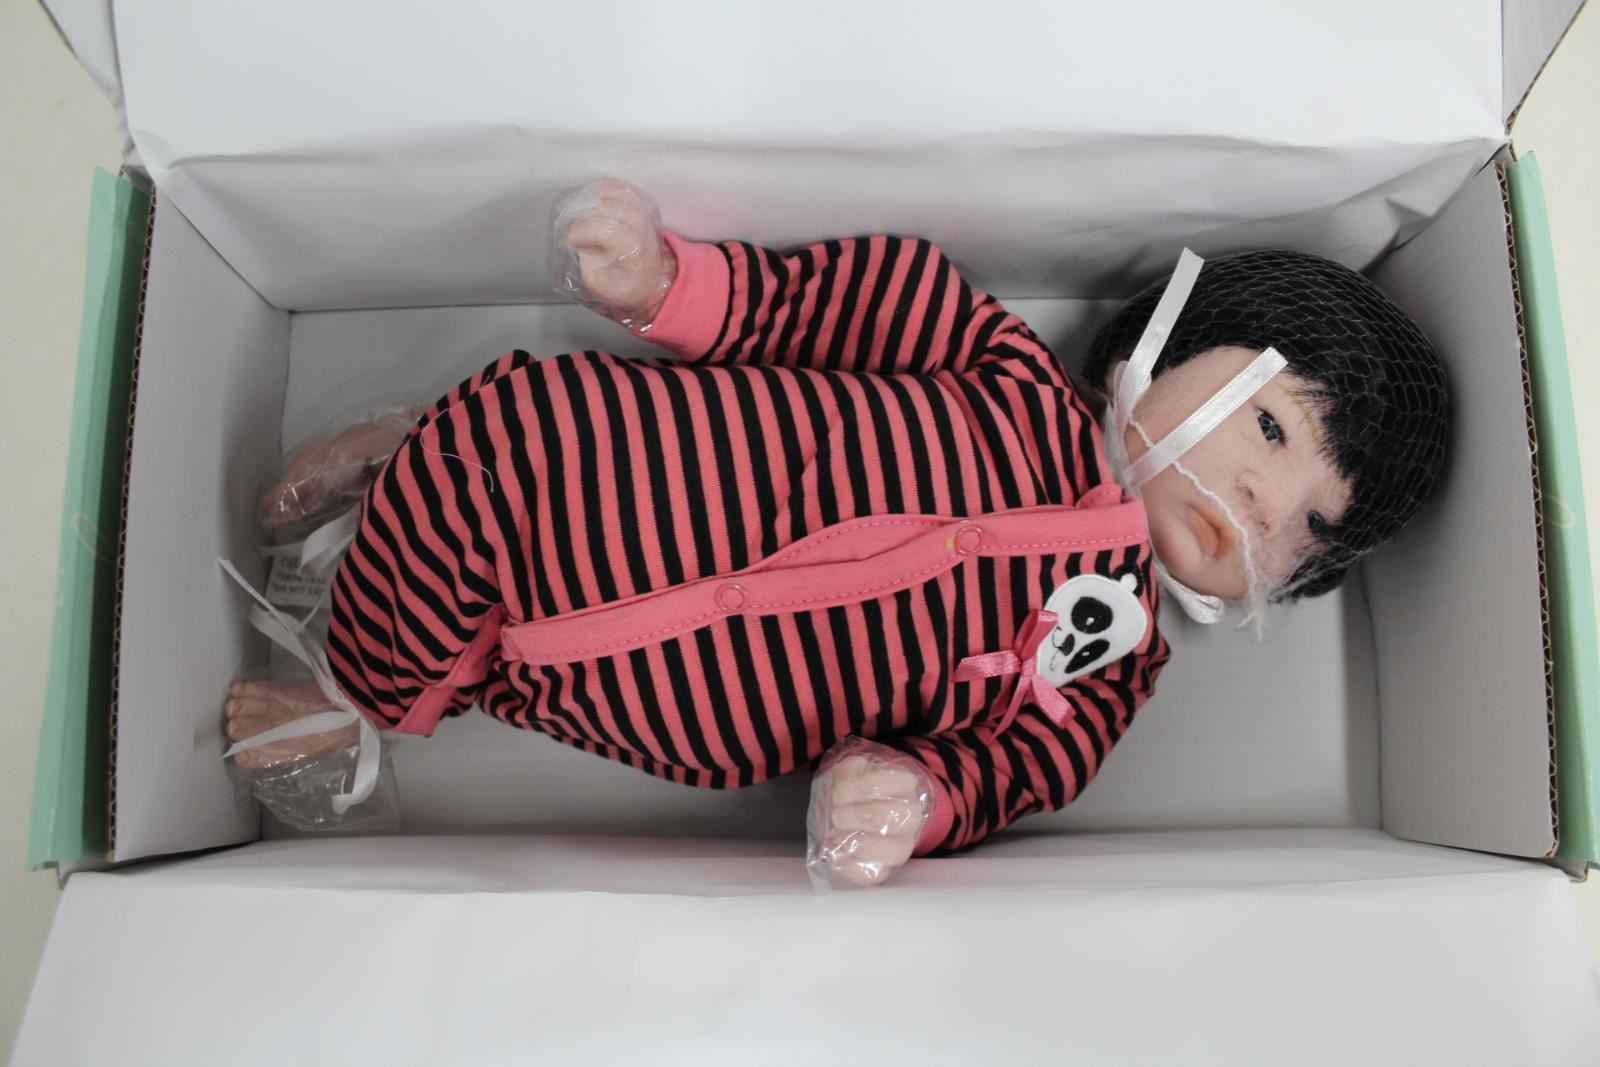 Amichevole Bnib Paradise Galleries Panda Twin Newborn Weighted Baby Doll Girl Hand Painted Guidare Un Commercio Ruggente